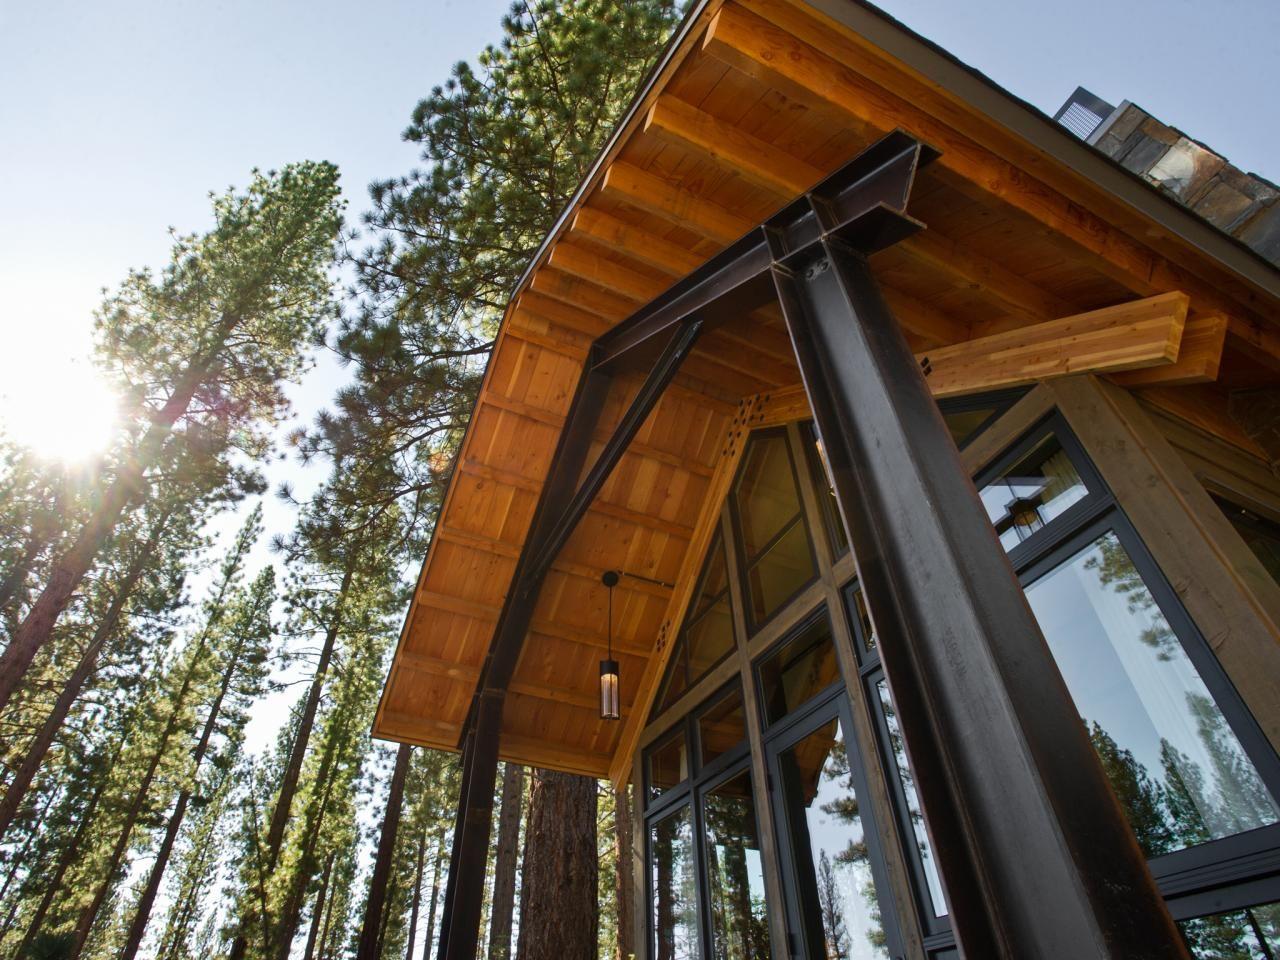 dream home 2014 backyard steel frame  hgtv and steel beams modern outdoor fireplace kits uk Modern Outdoor Fire Pit